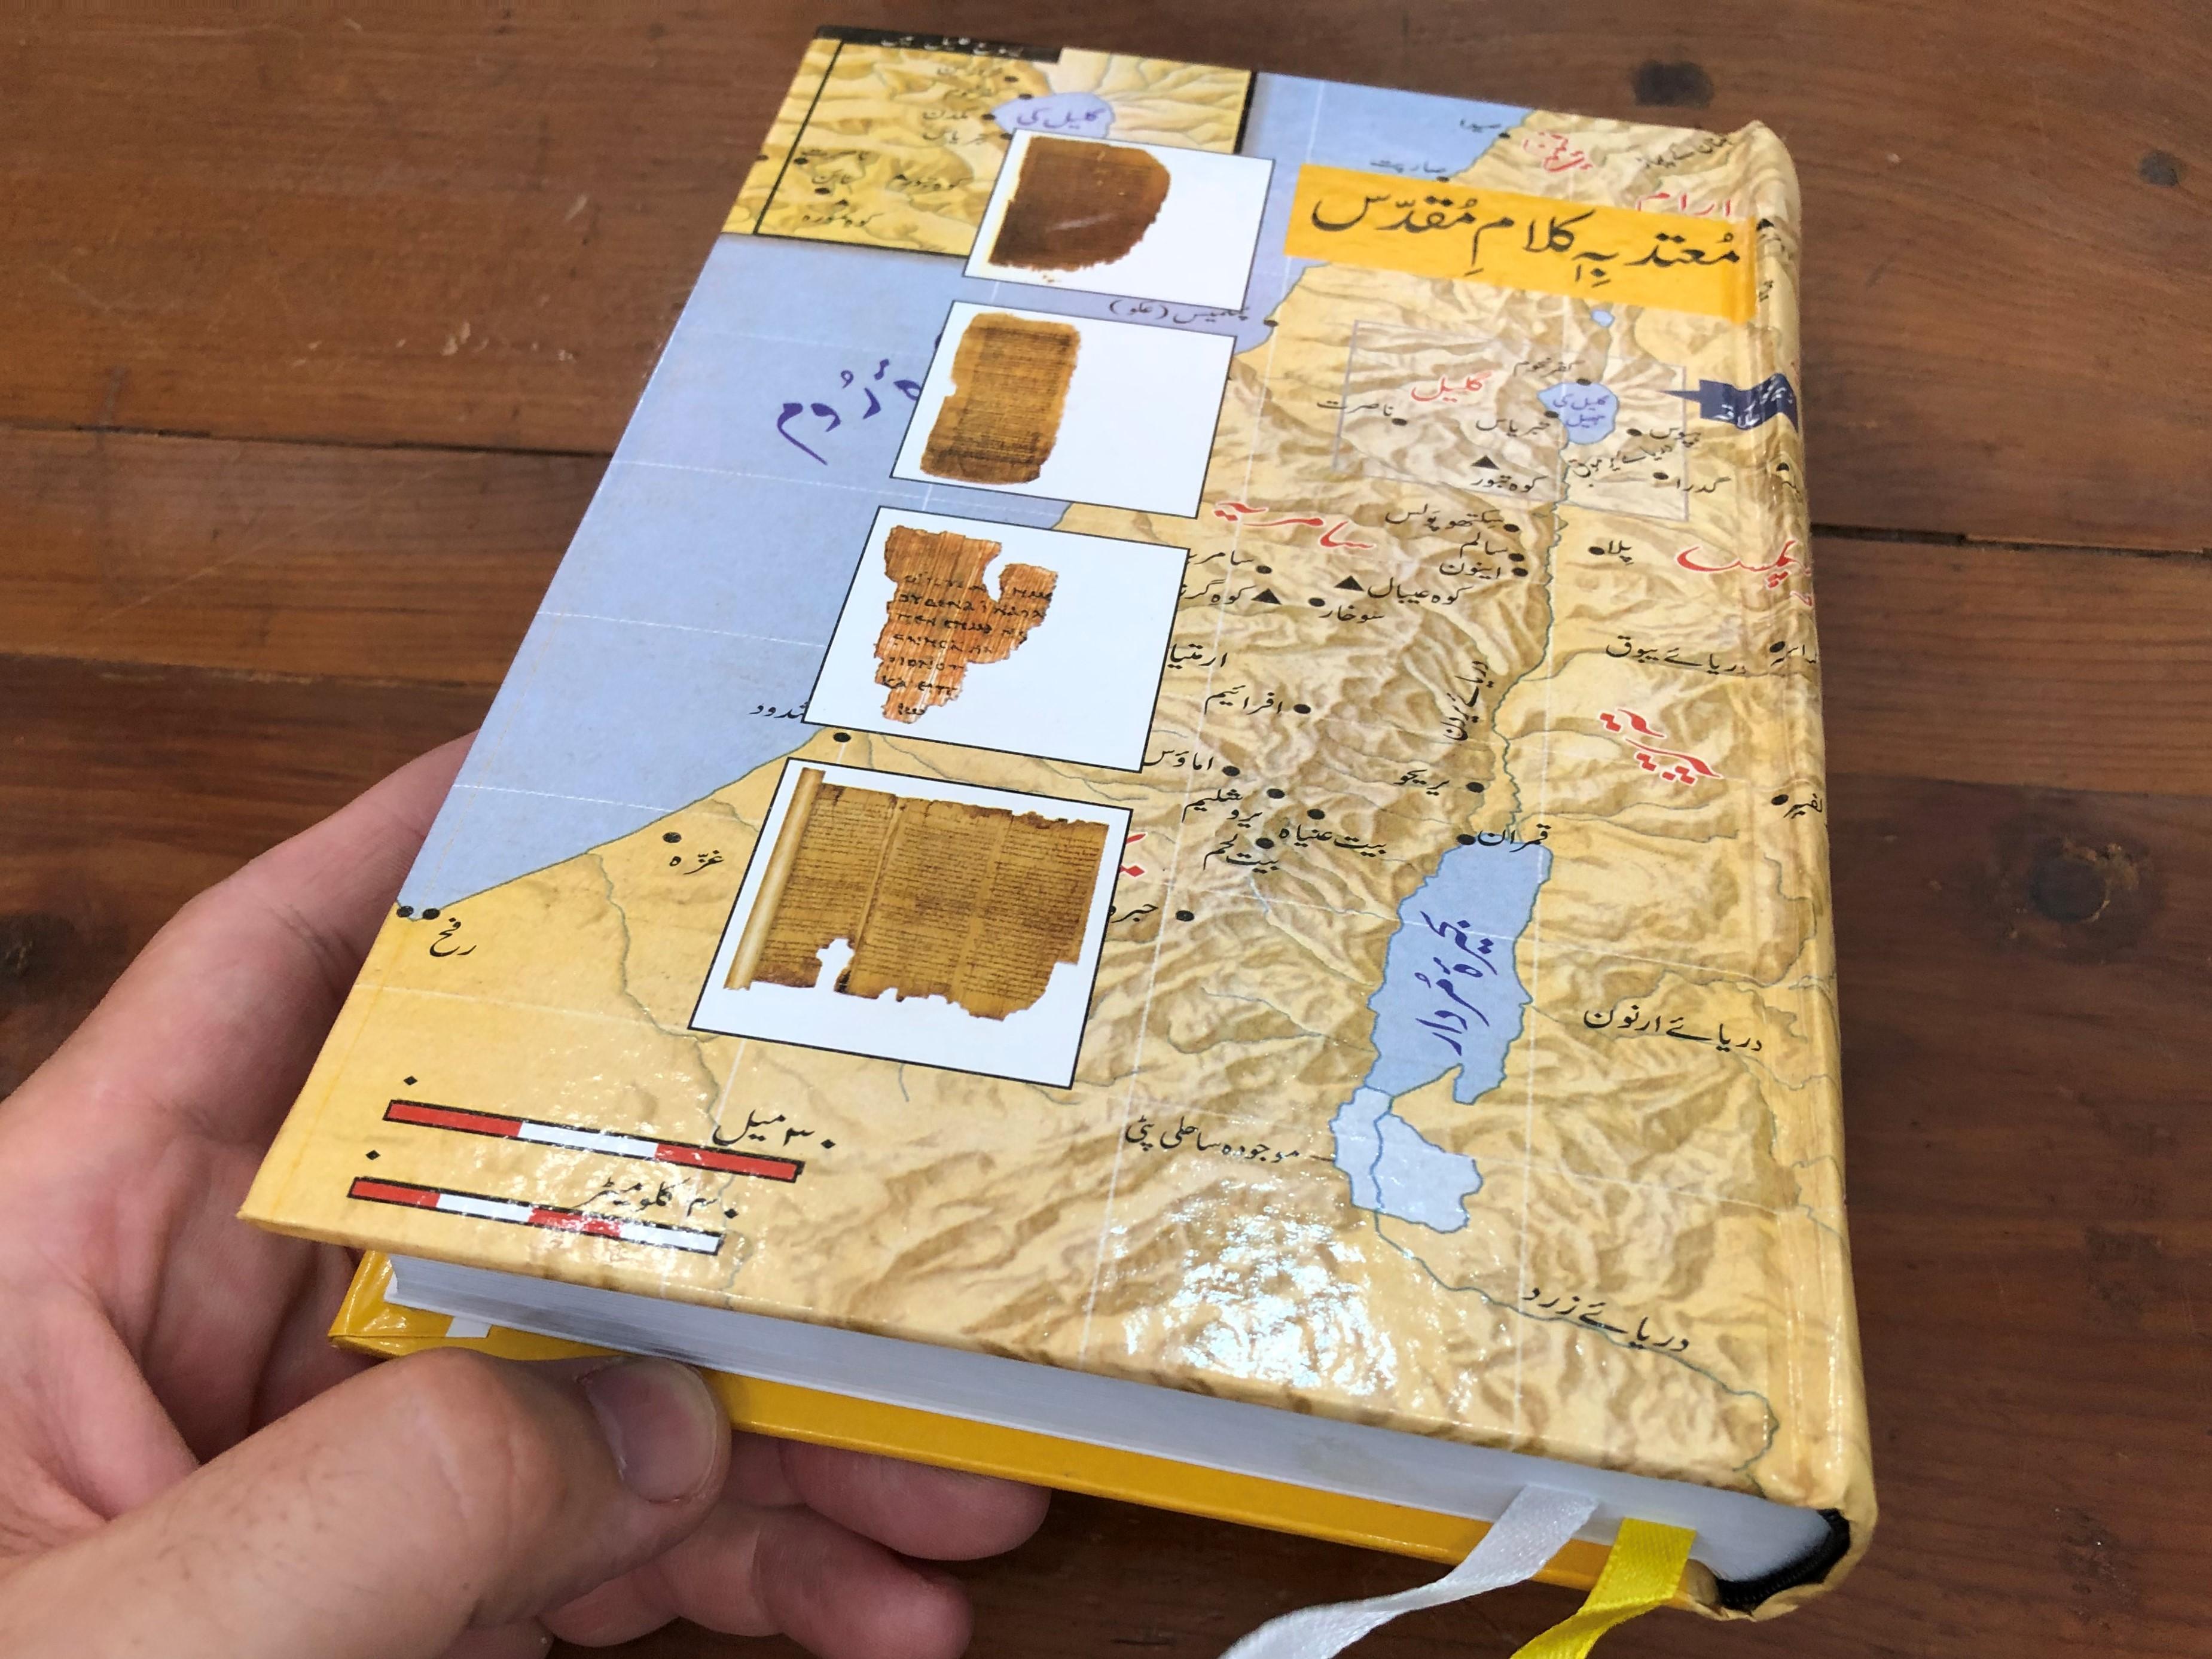 discover-the-bible-in-urdu-language-motdaba-kalam-e-muqadds-hardcover-2013-pakistan-bible-society-20-.jpg